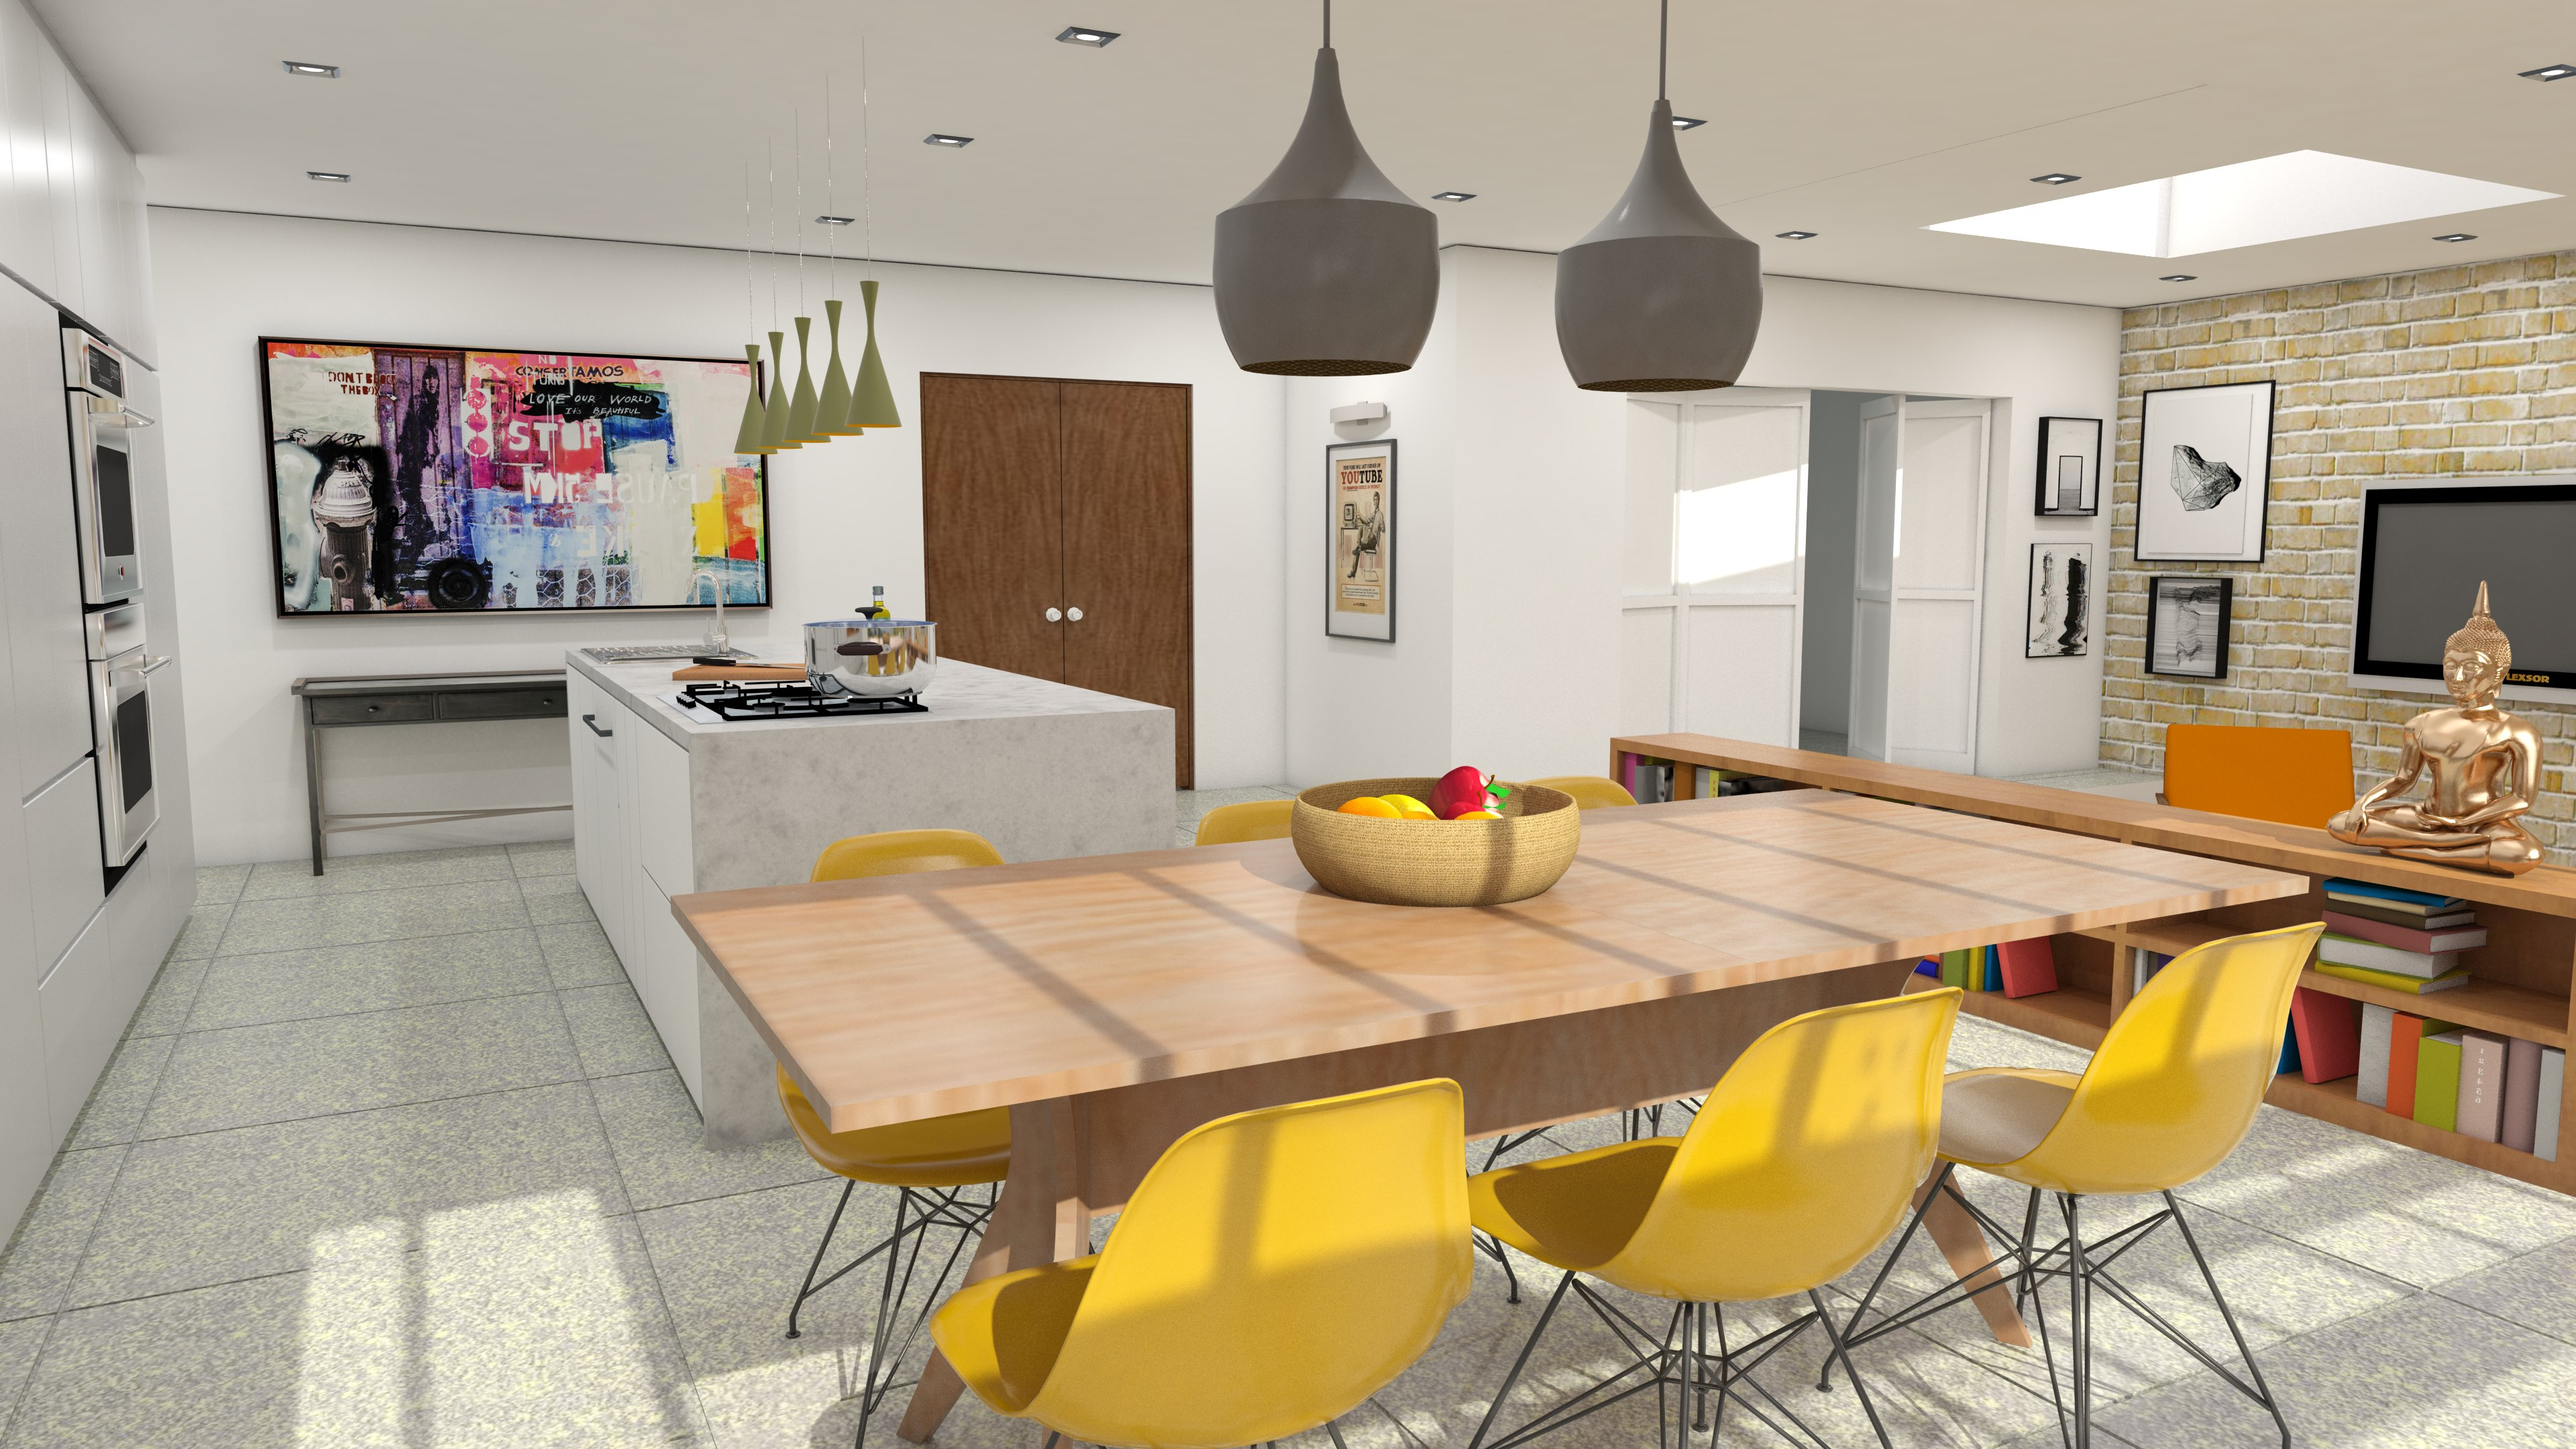 An island kitchen